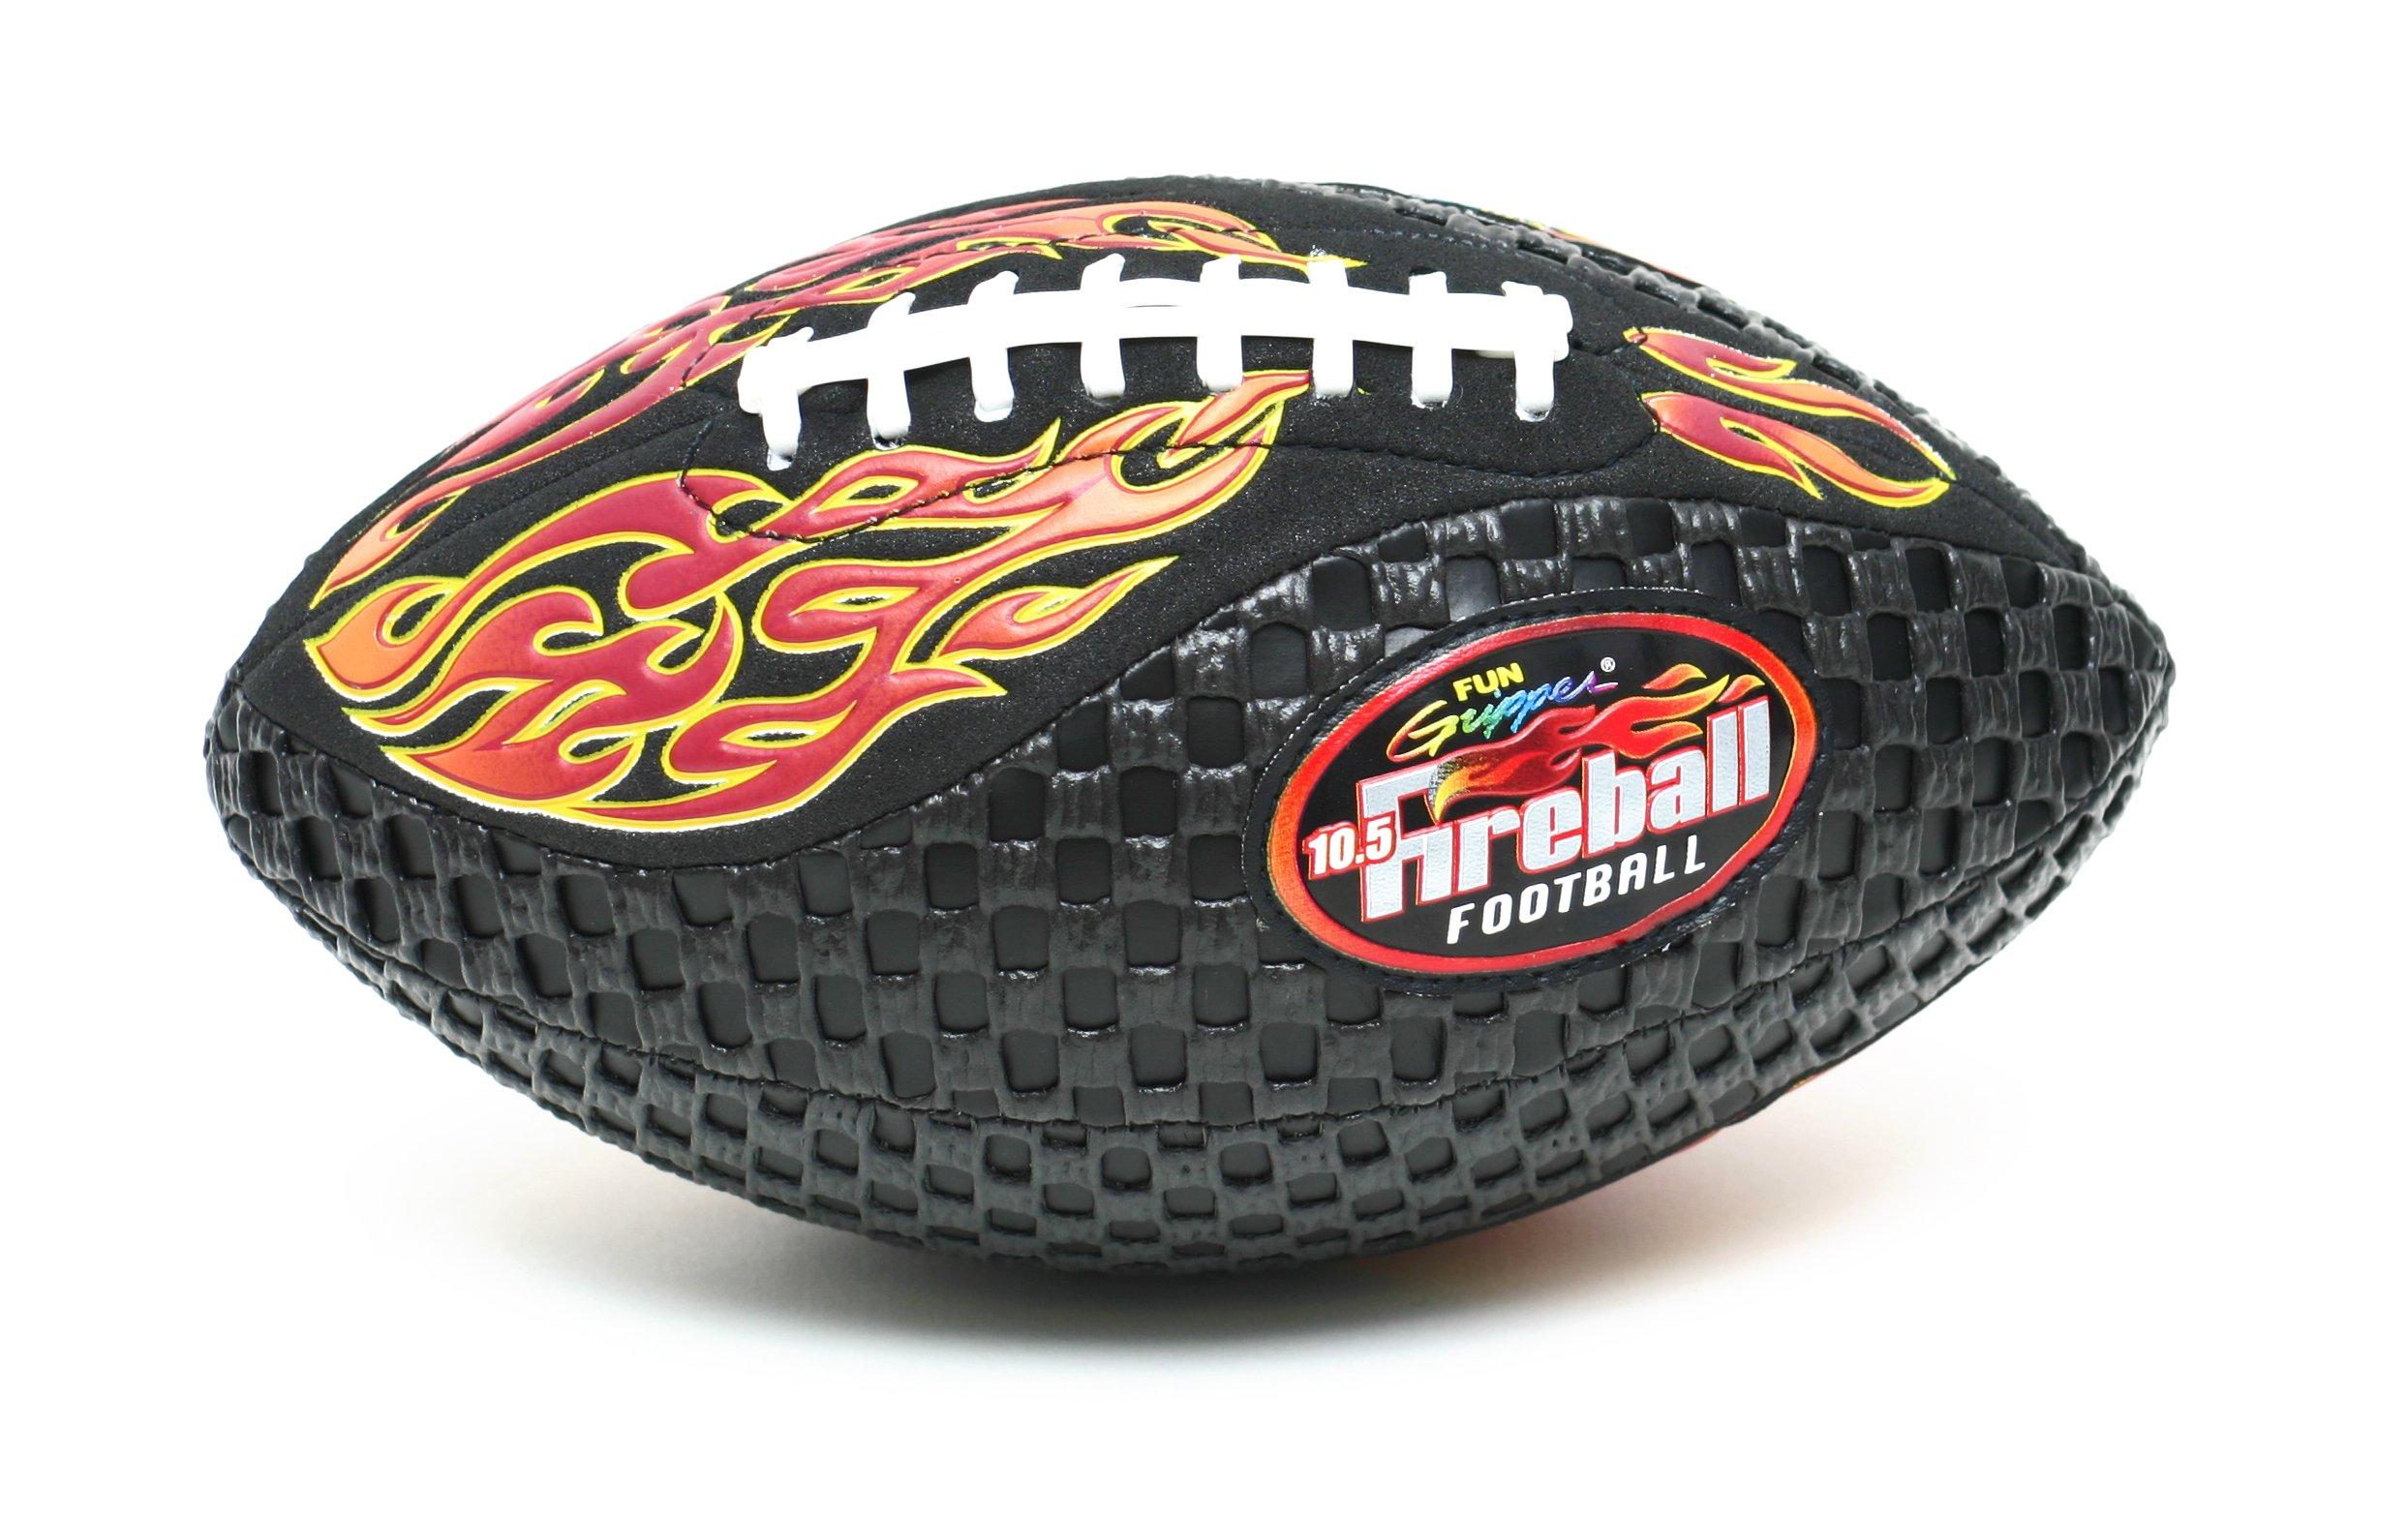 Fun Gripper Fireball 10.5 Jr (Youth) Football Orange By: Saturnian I P.E. Supplier